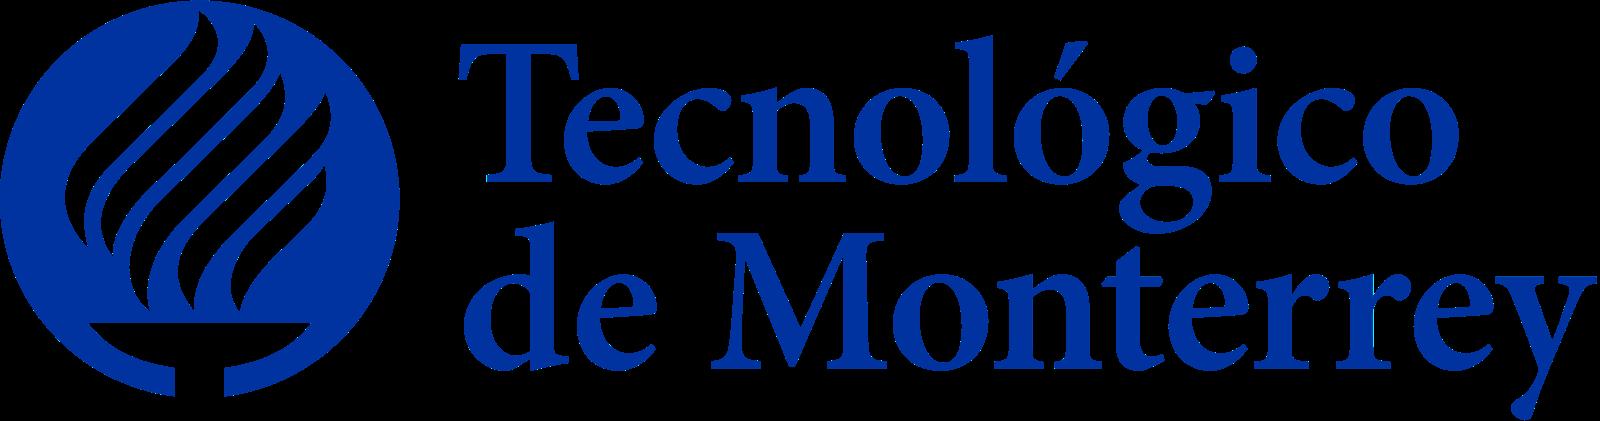 https://0201.nccdn.net/1_2/000/000/0c5/b93/tecnologico-de-monterrey-blue.png